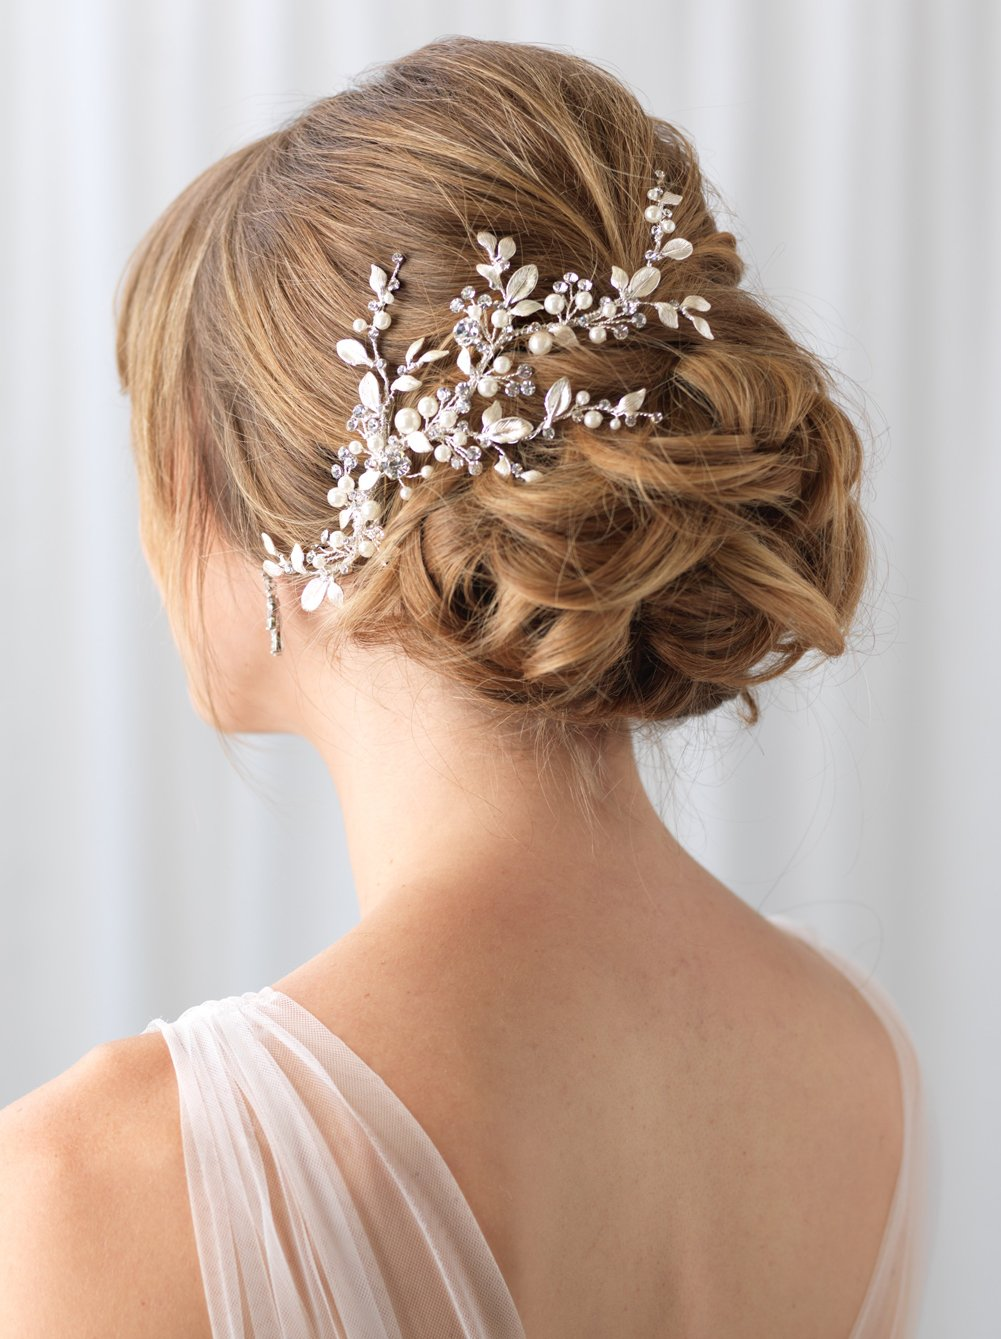 USABride Wedding Comb Sliver-Plated Vine Bridal Headpiece Simulated Pearls Rhinestones Hair Clip TC-2313-S (Silver)